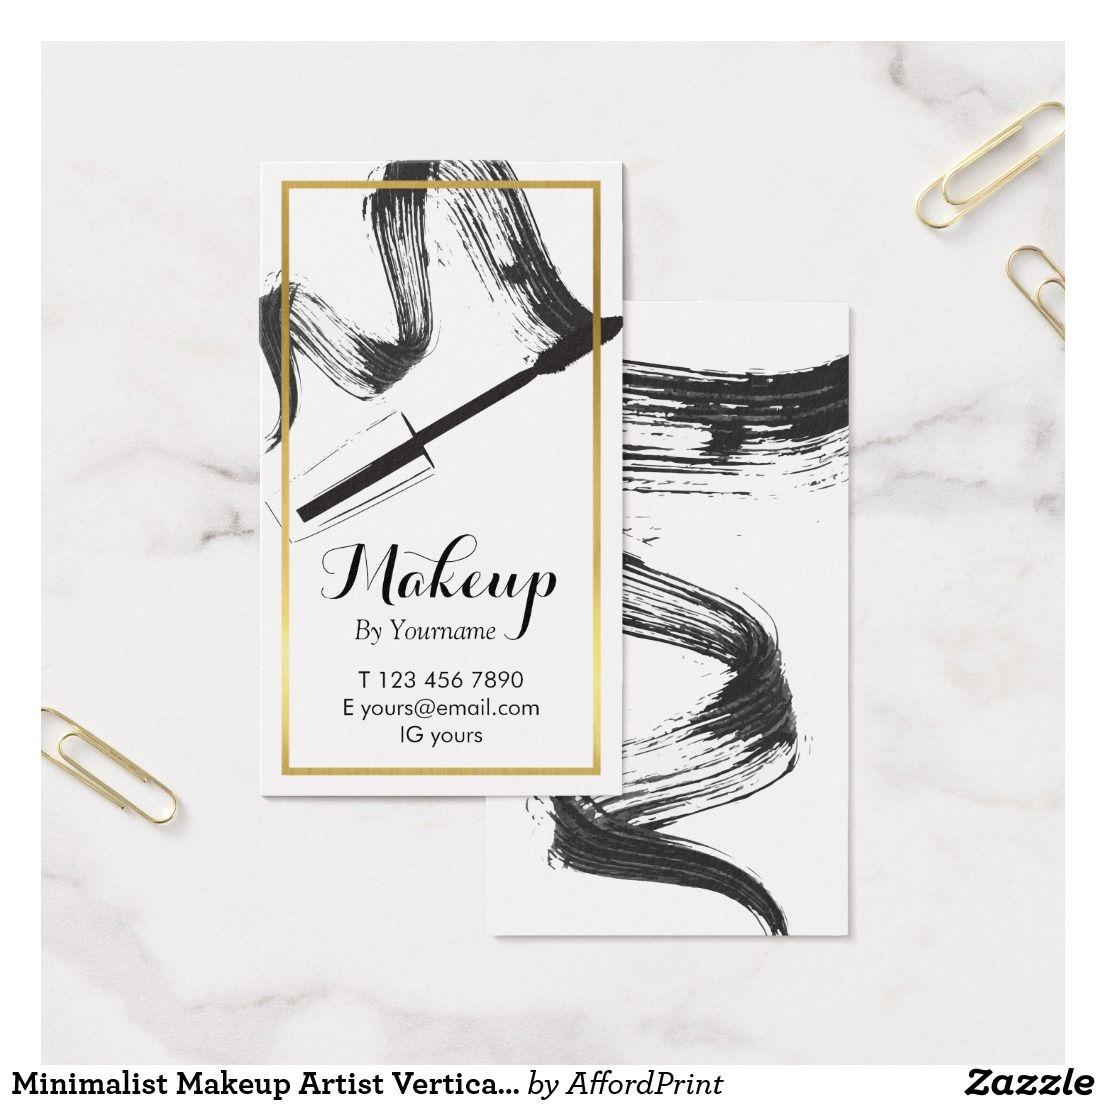 Minimalist Makeup Artist Vertical Business Card Zazzle